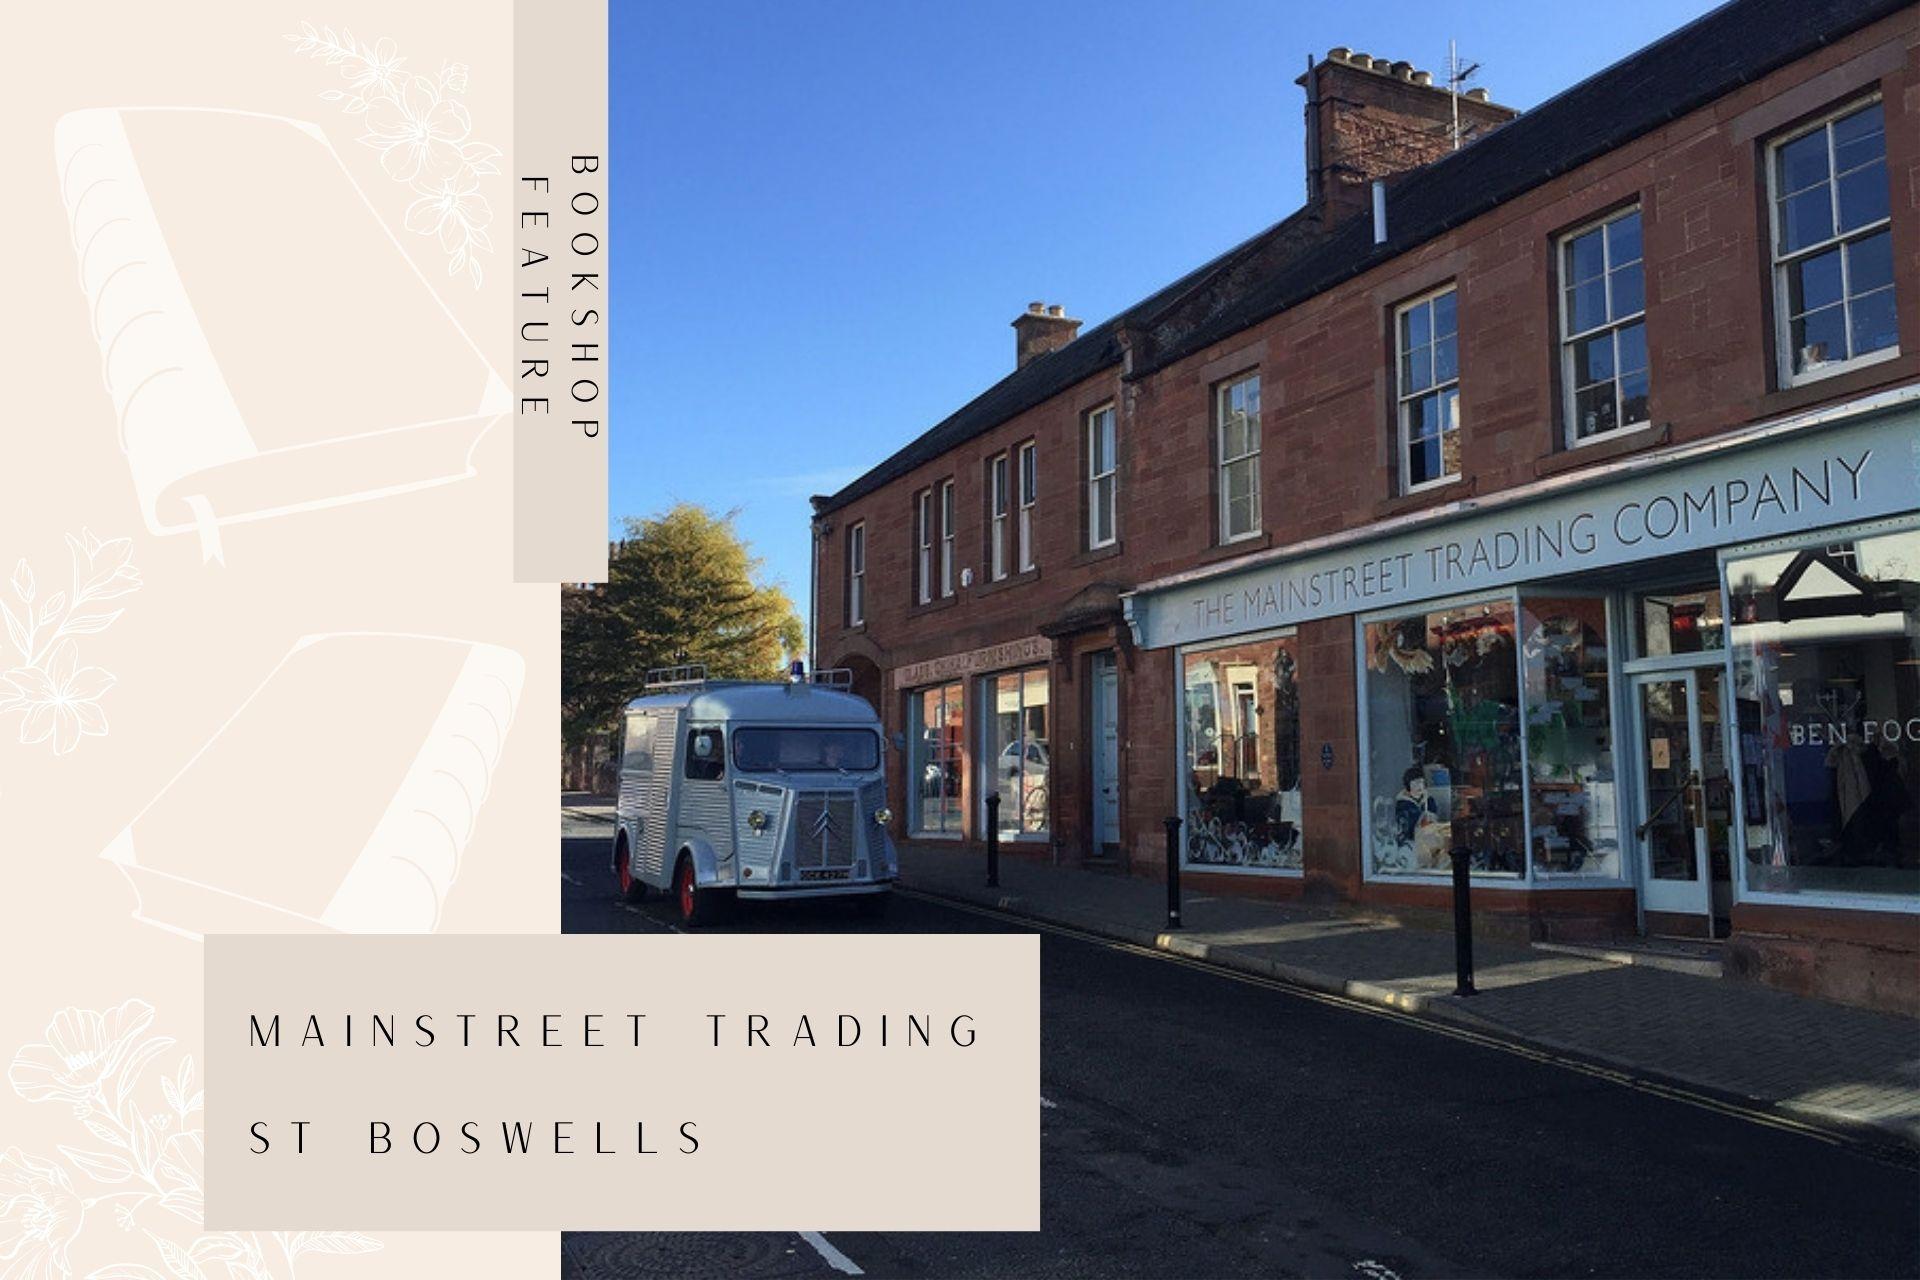 LoveReading Bookshop Feature: Mainstreet Trading (St Boswells, Scotland)